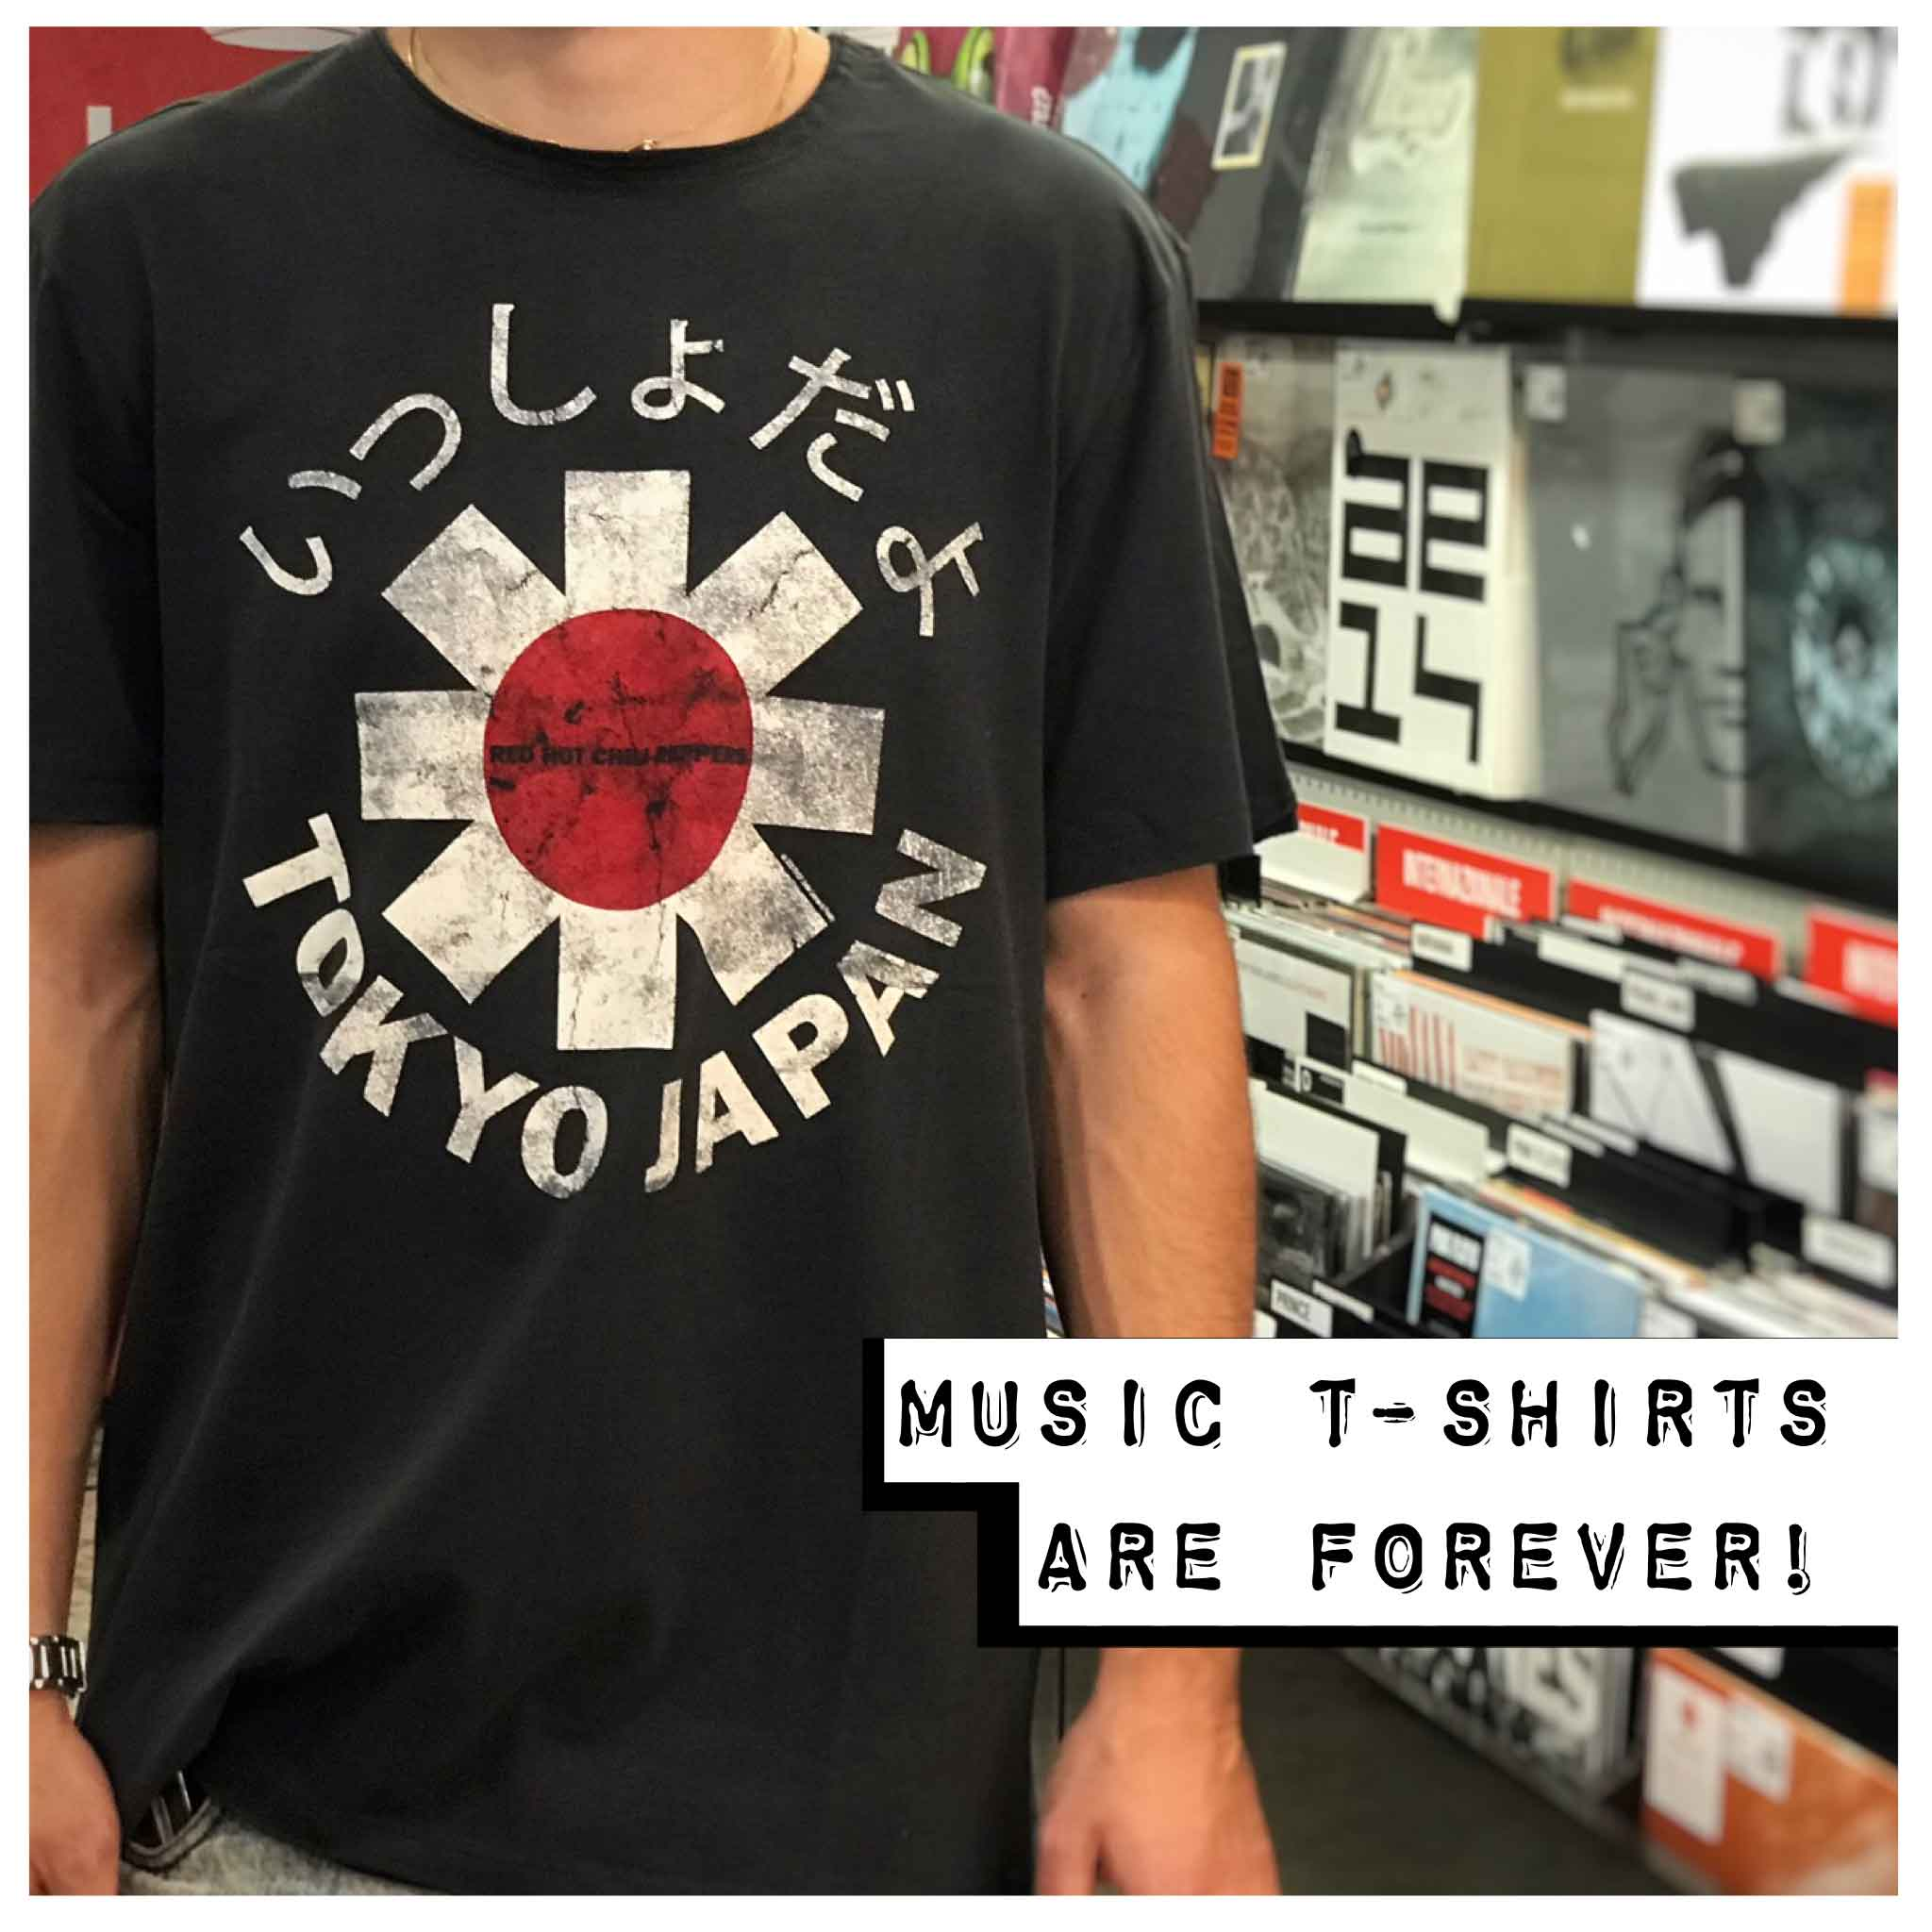 Semm Music Store T-shirt-Tokyo Japan